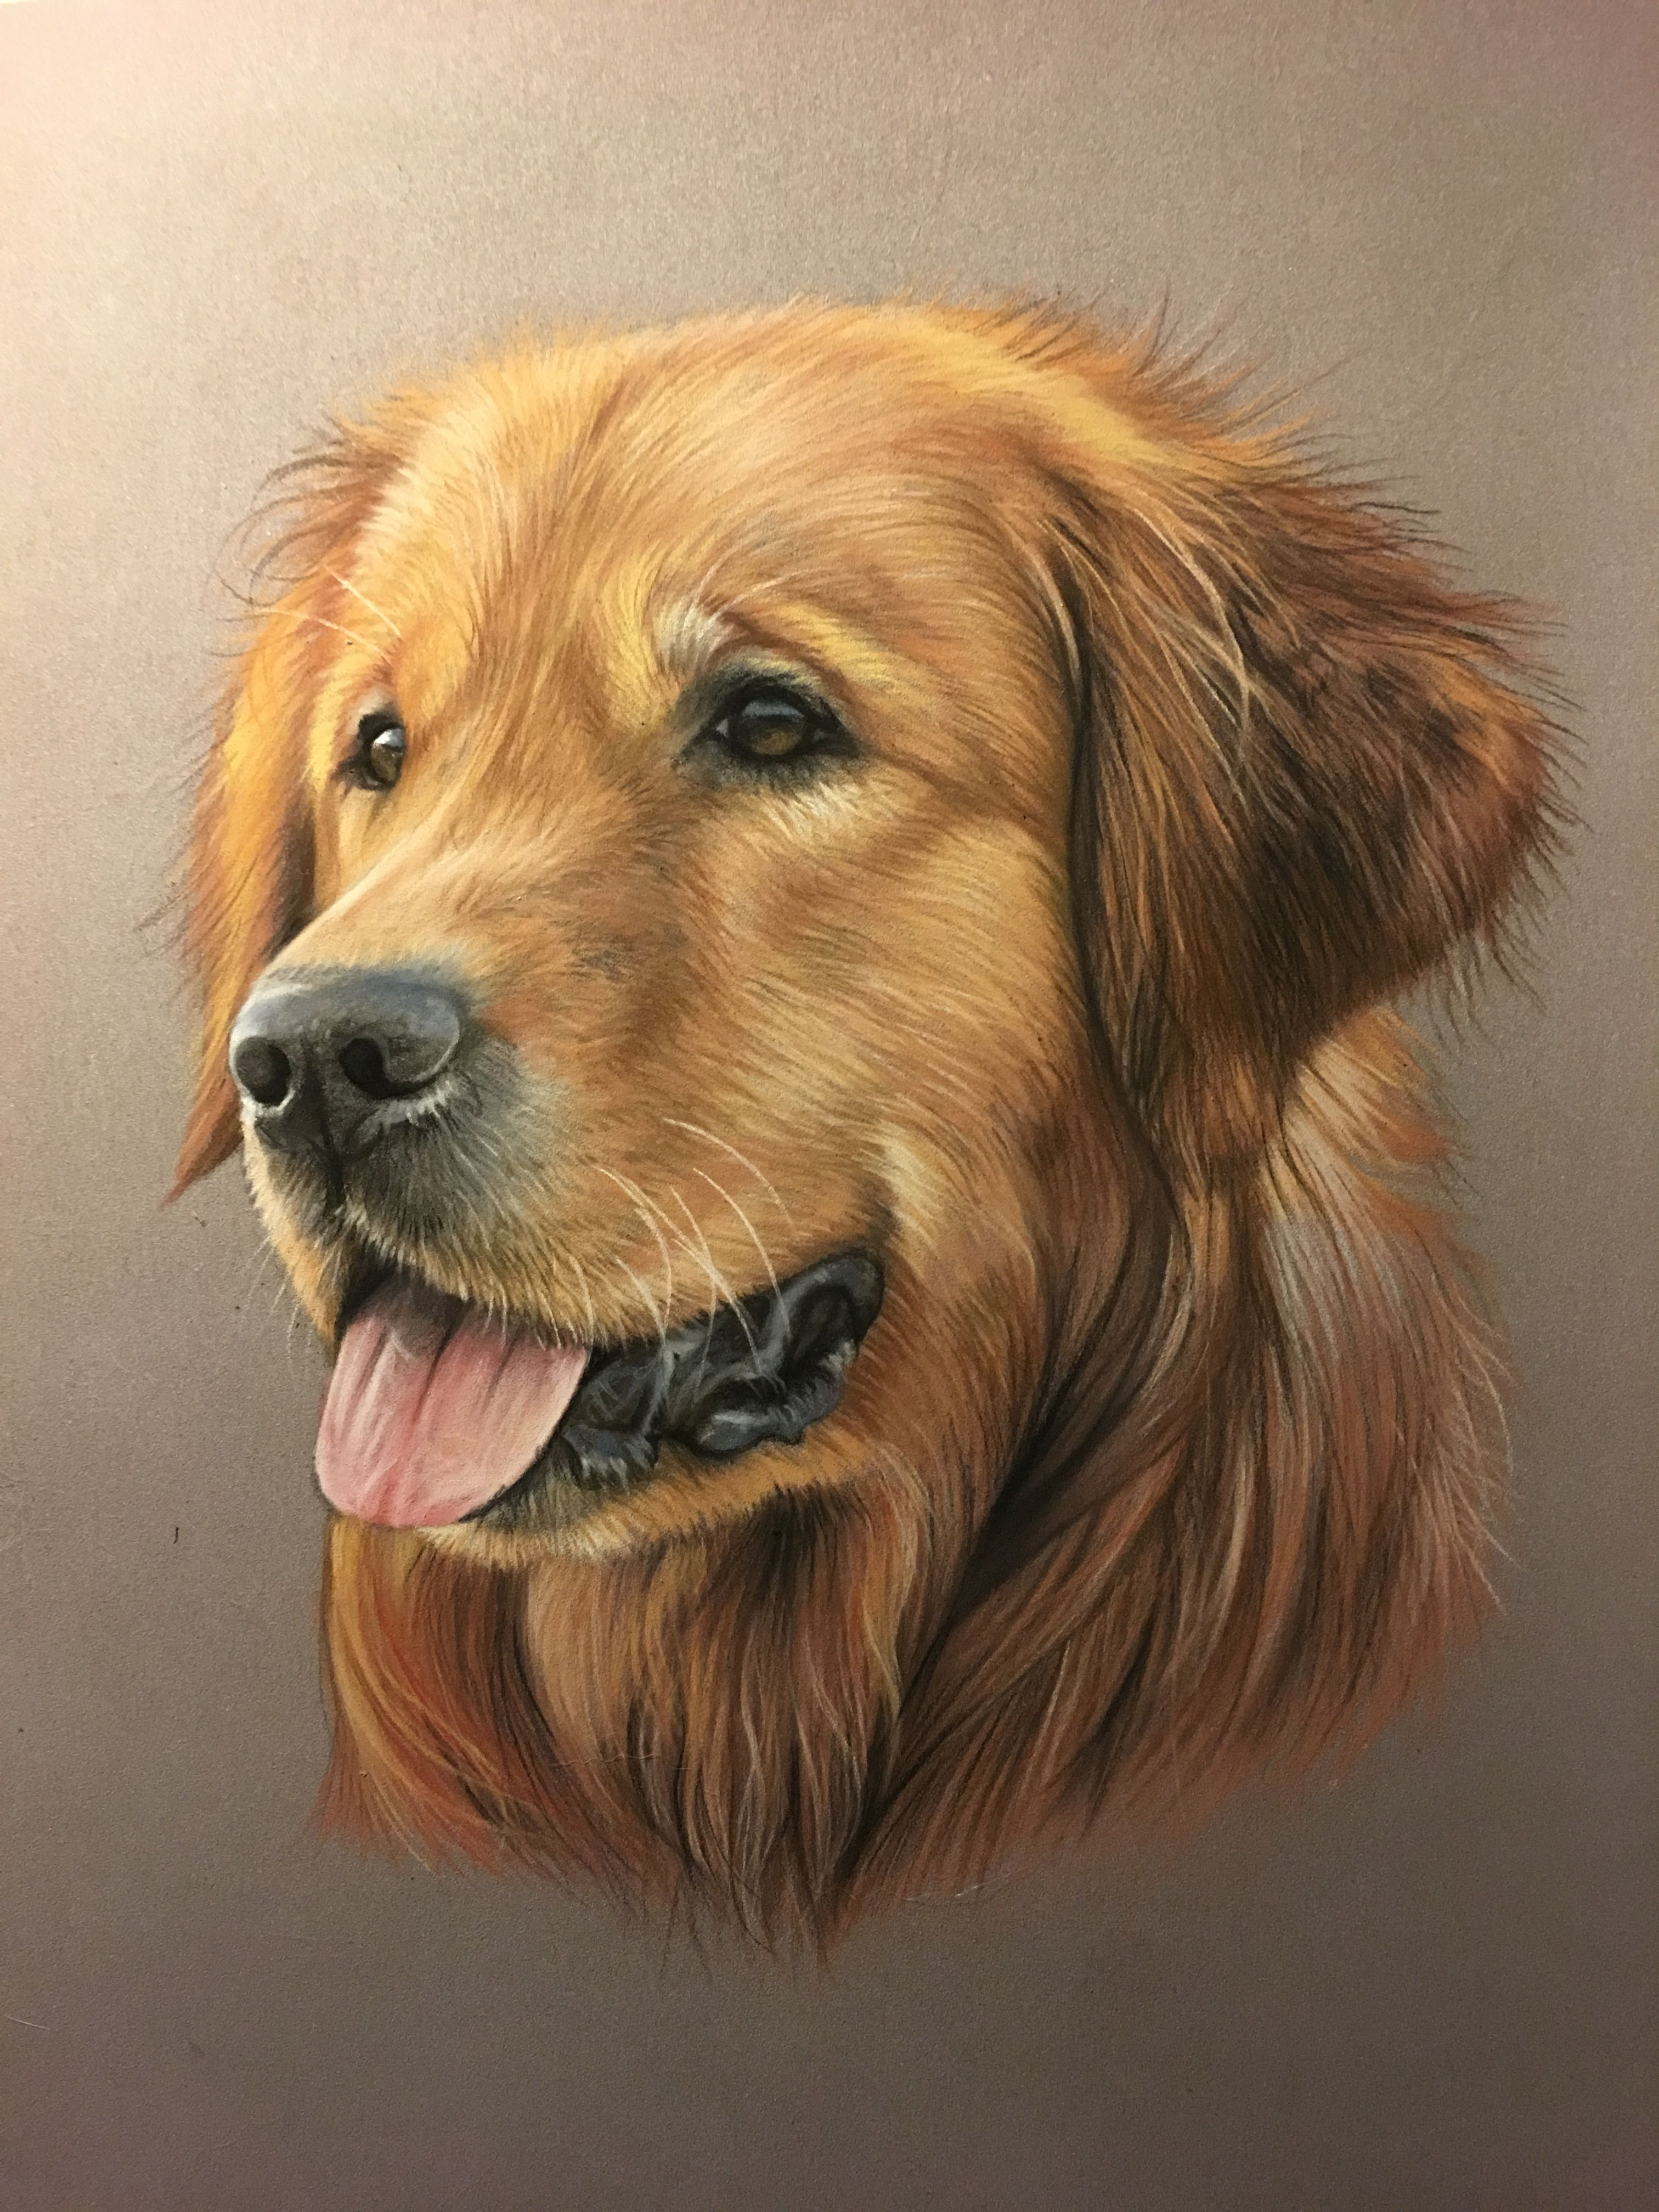 Golden Retriever Au Pastel Dessin Animalier Art Animalier Peinture Animaliere Dessin De Chien Peintures De Chien Peintures Animalieres